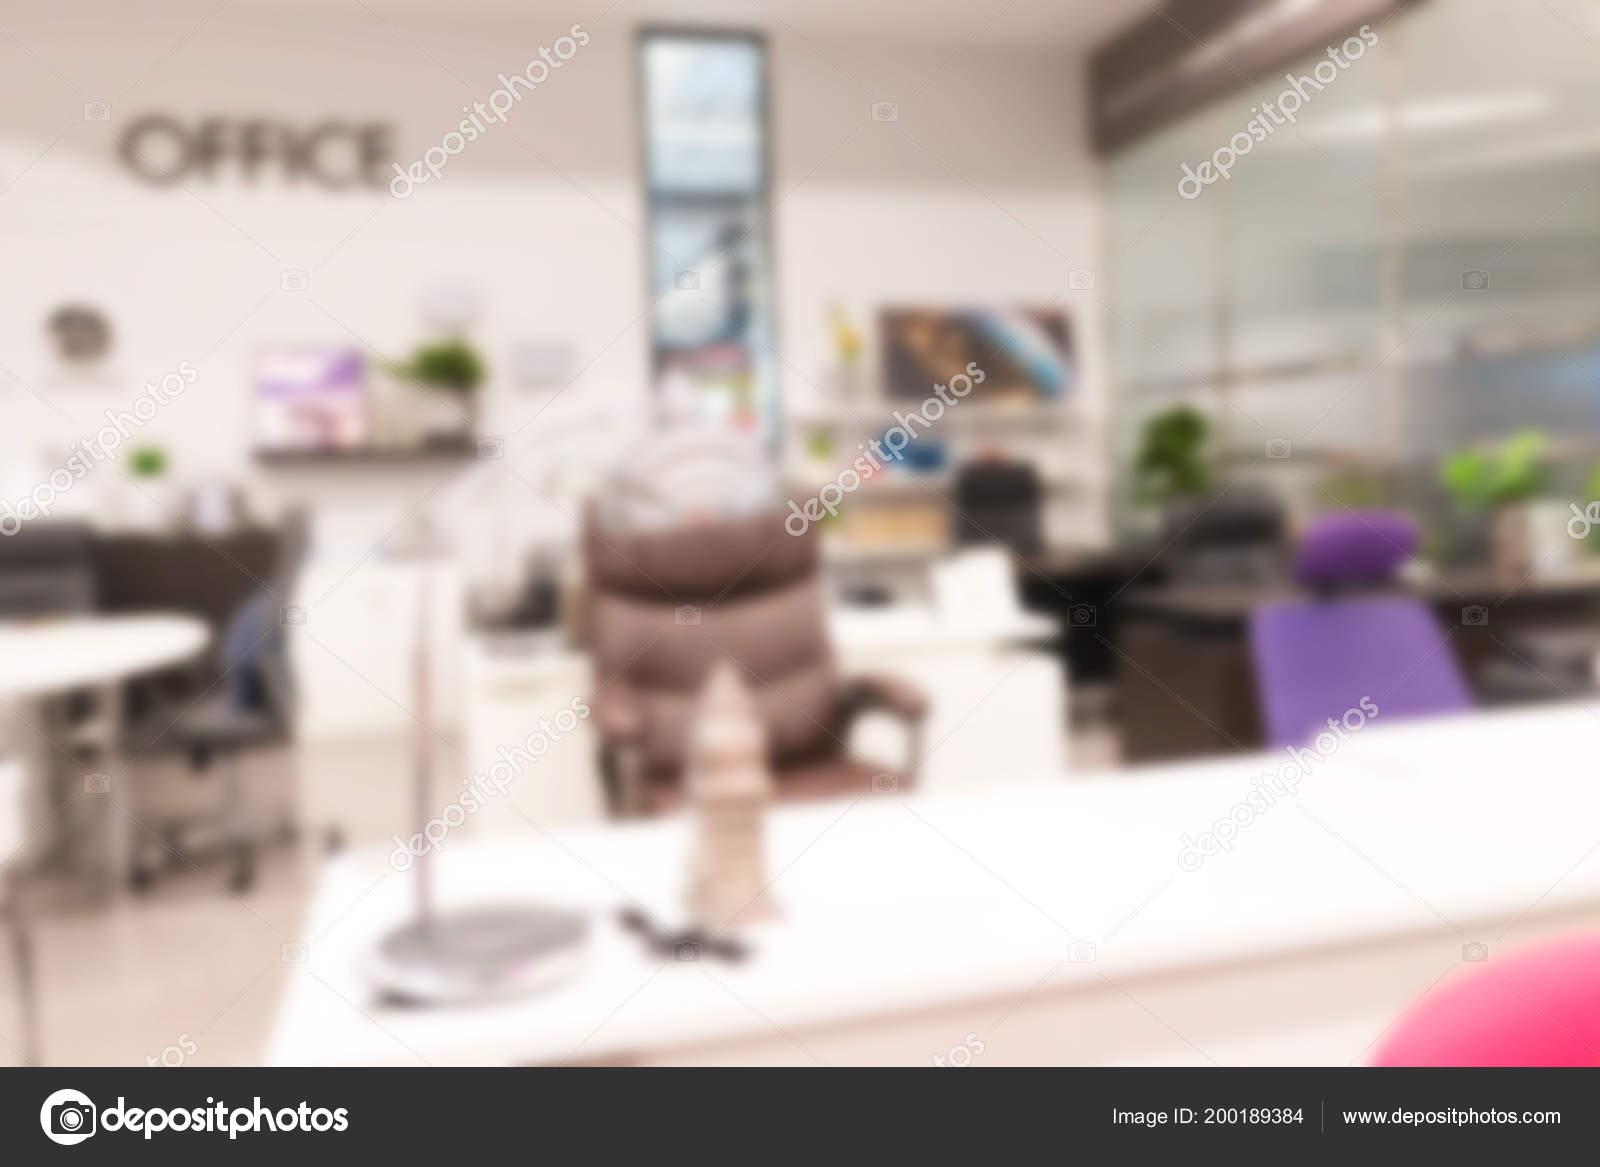 Abstractblurred espace travail bureau moderne table travail bureau